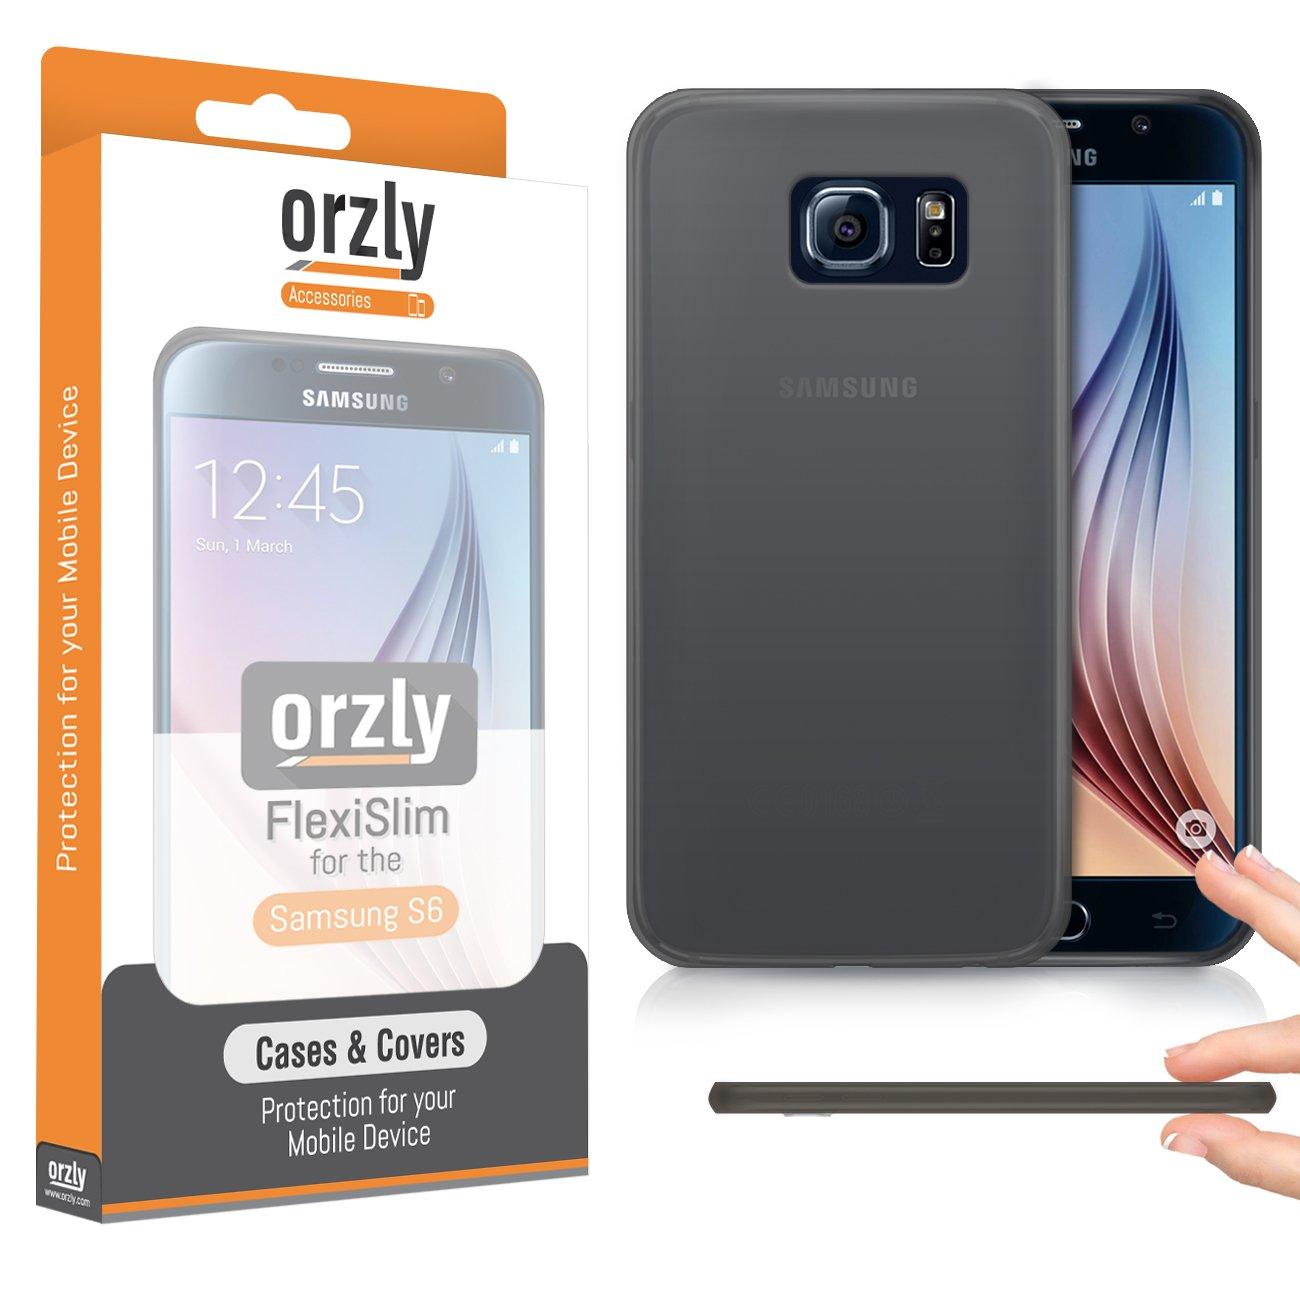 Orzly® - FlexiSlim Case for Samsung Galaxy S6: Amazon.es: Electrónica